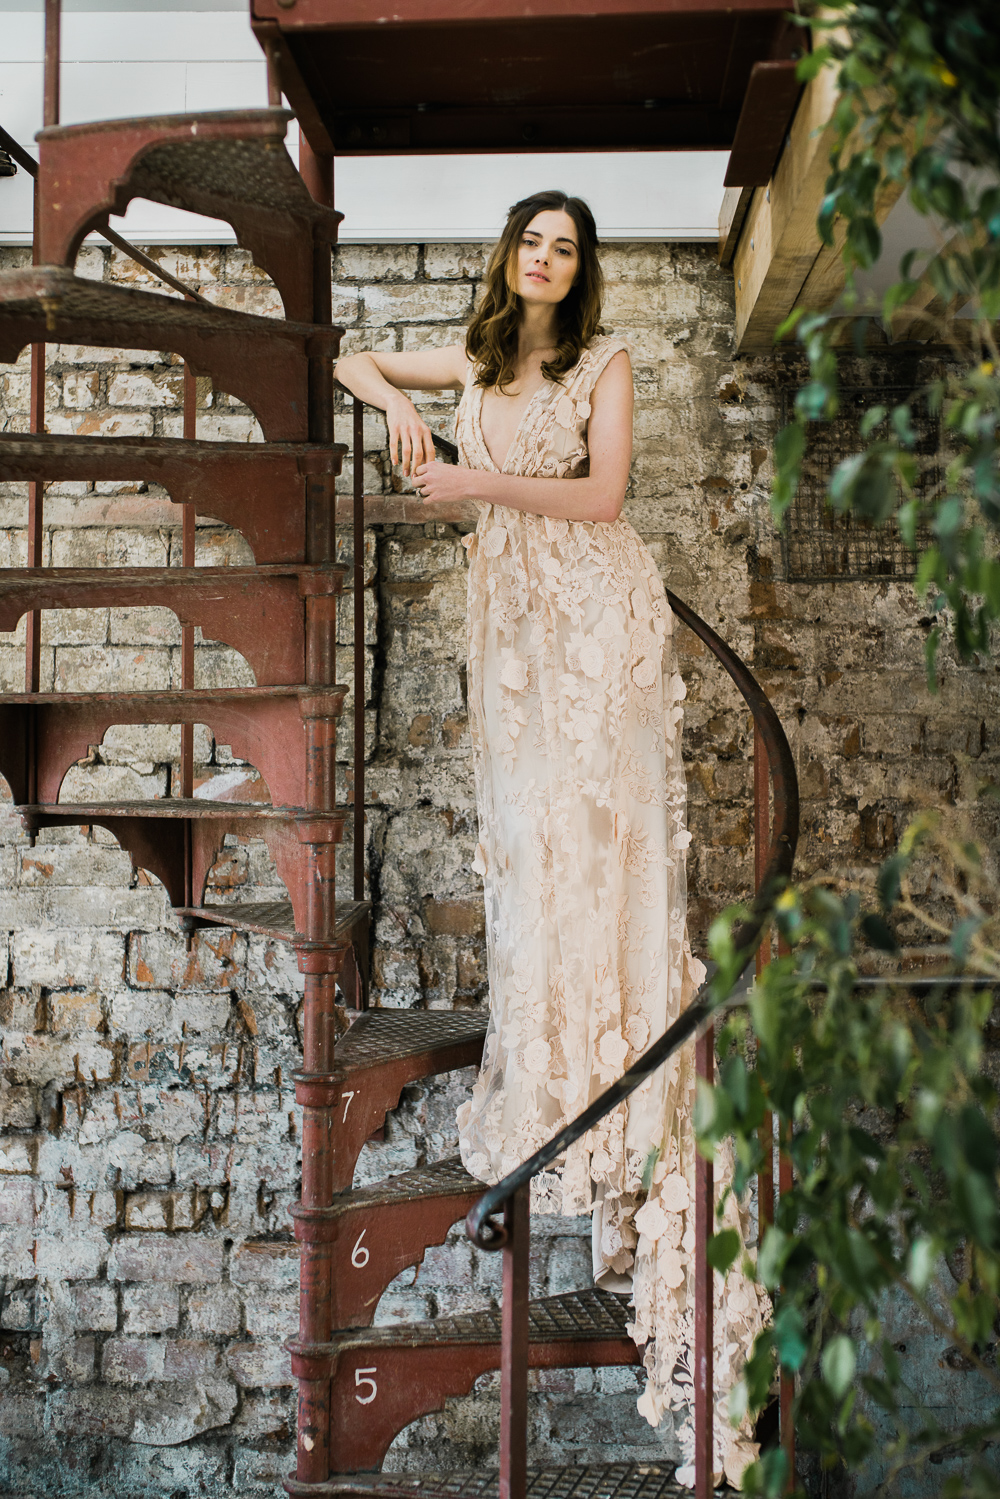 Wedding dress by Halfpenny London featured on Rock My Wedding blog   Image by John Barwood Photography